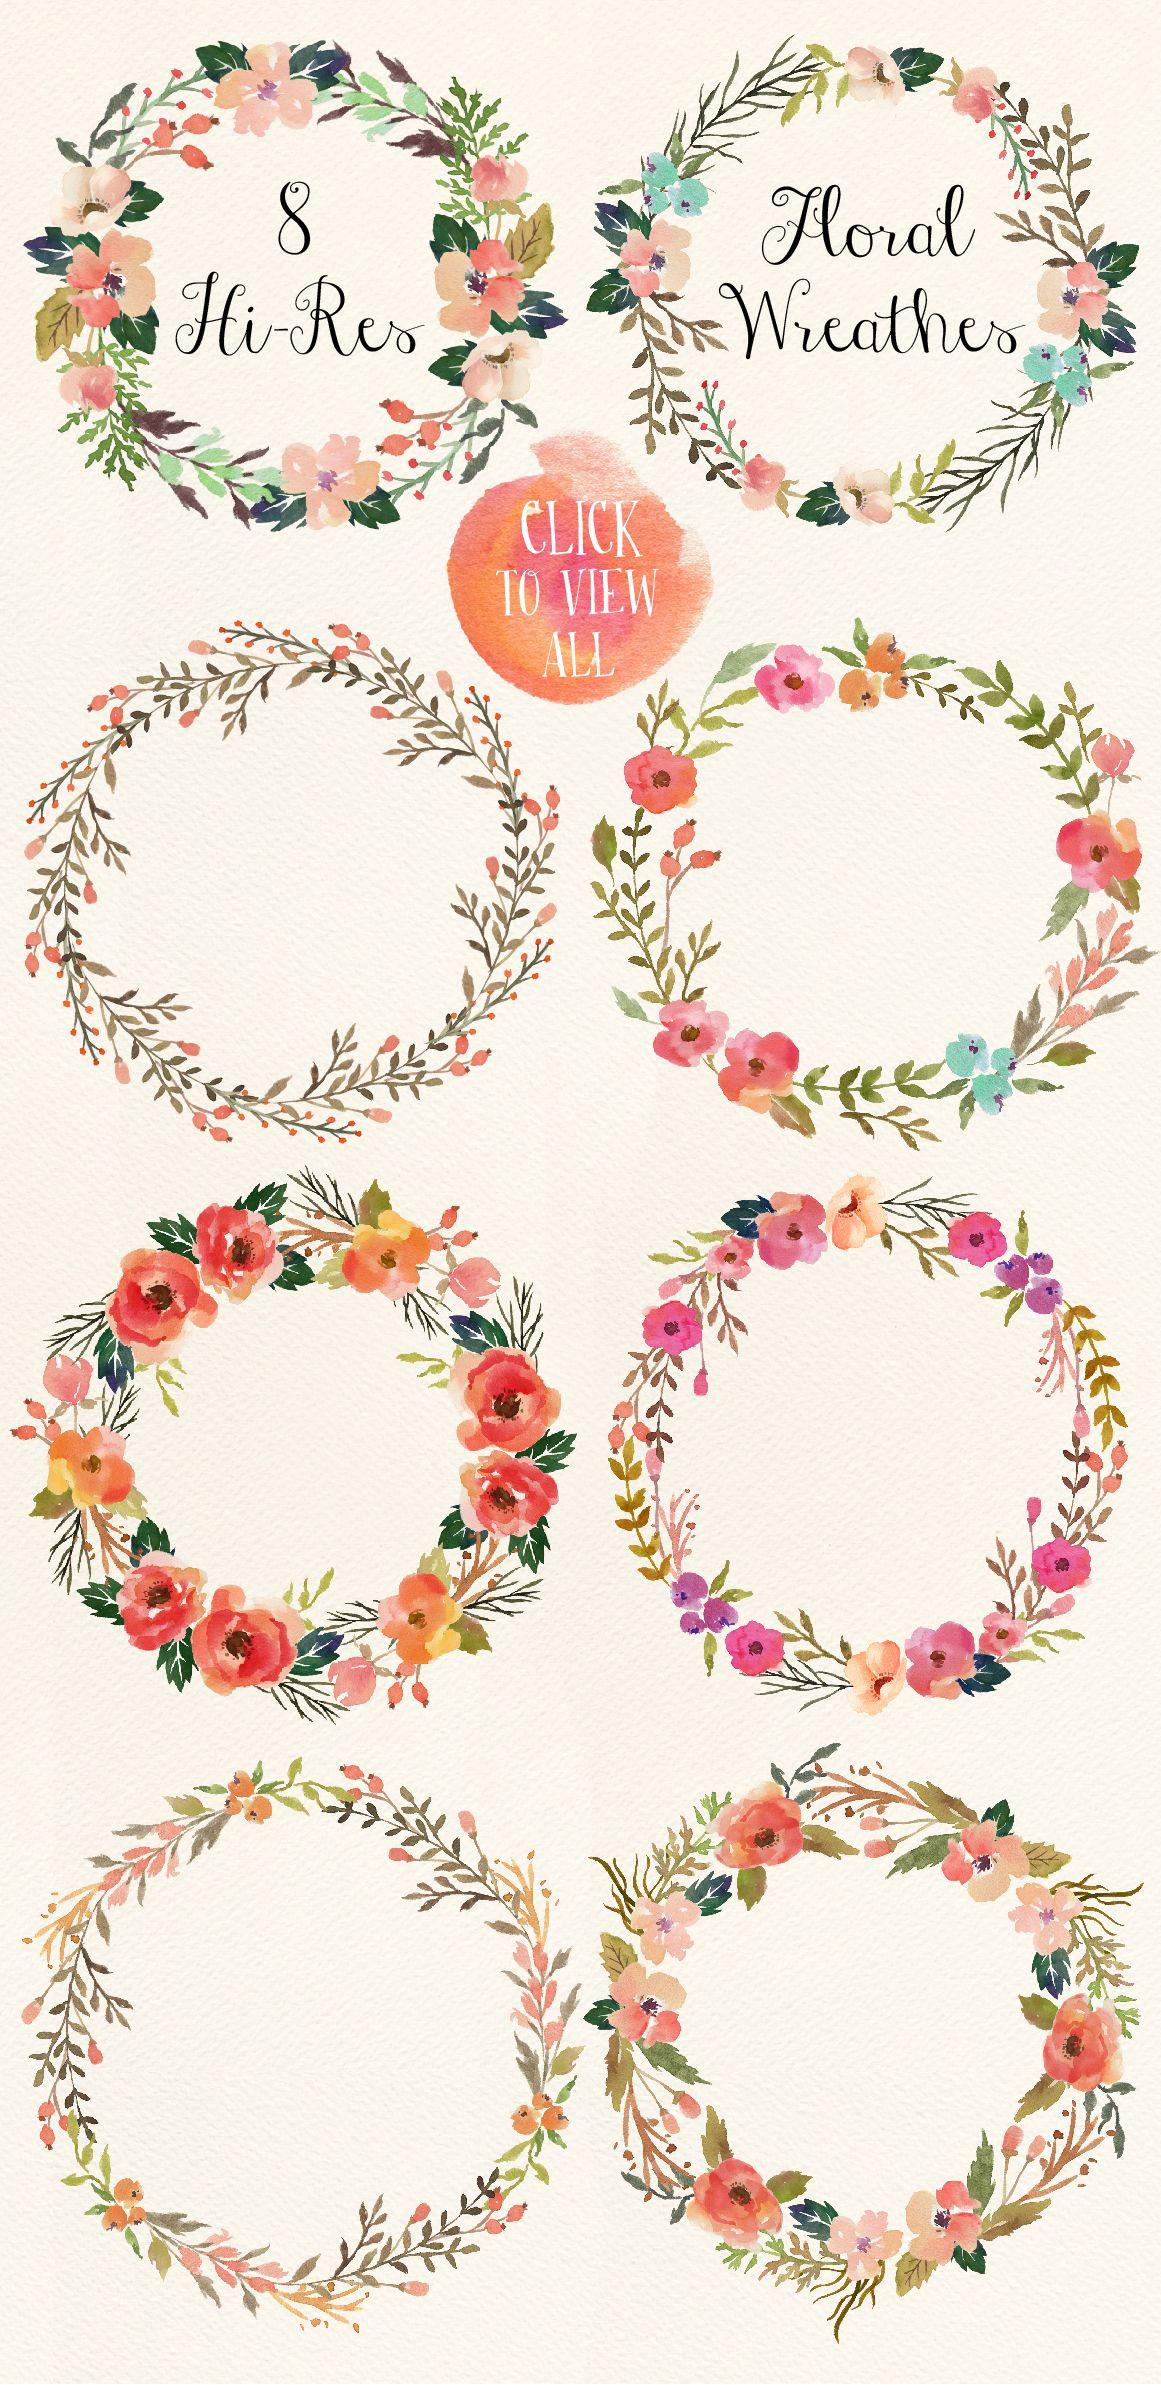 Flower Illustrations on Pinterest | Vintage Botanical Illustration ...